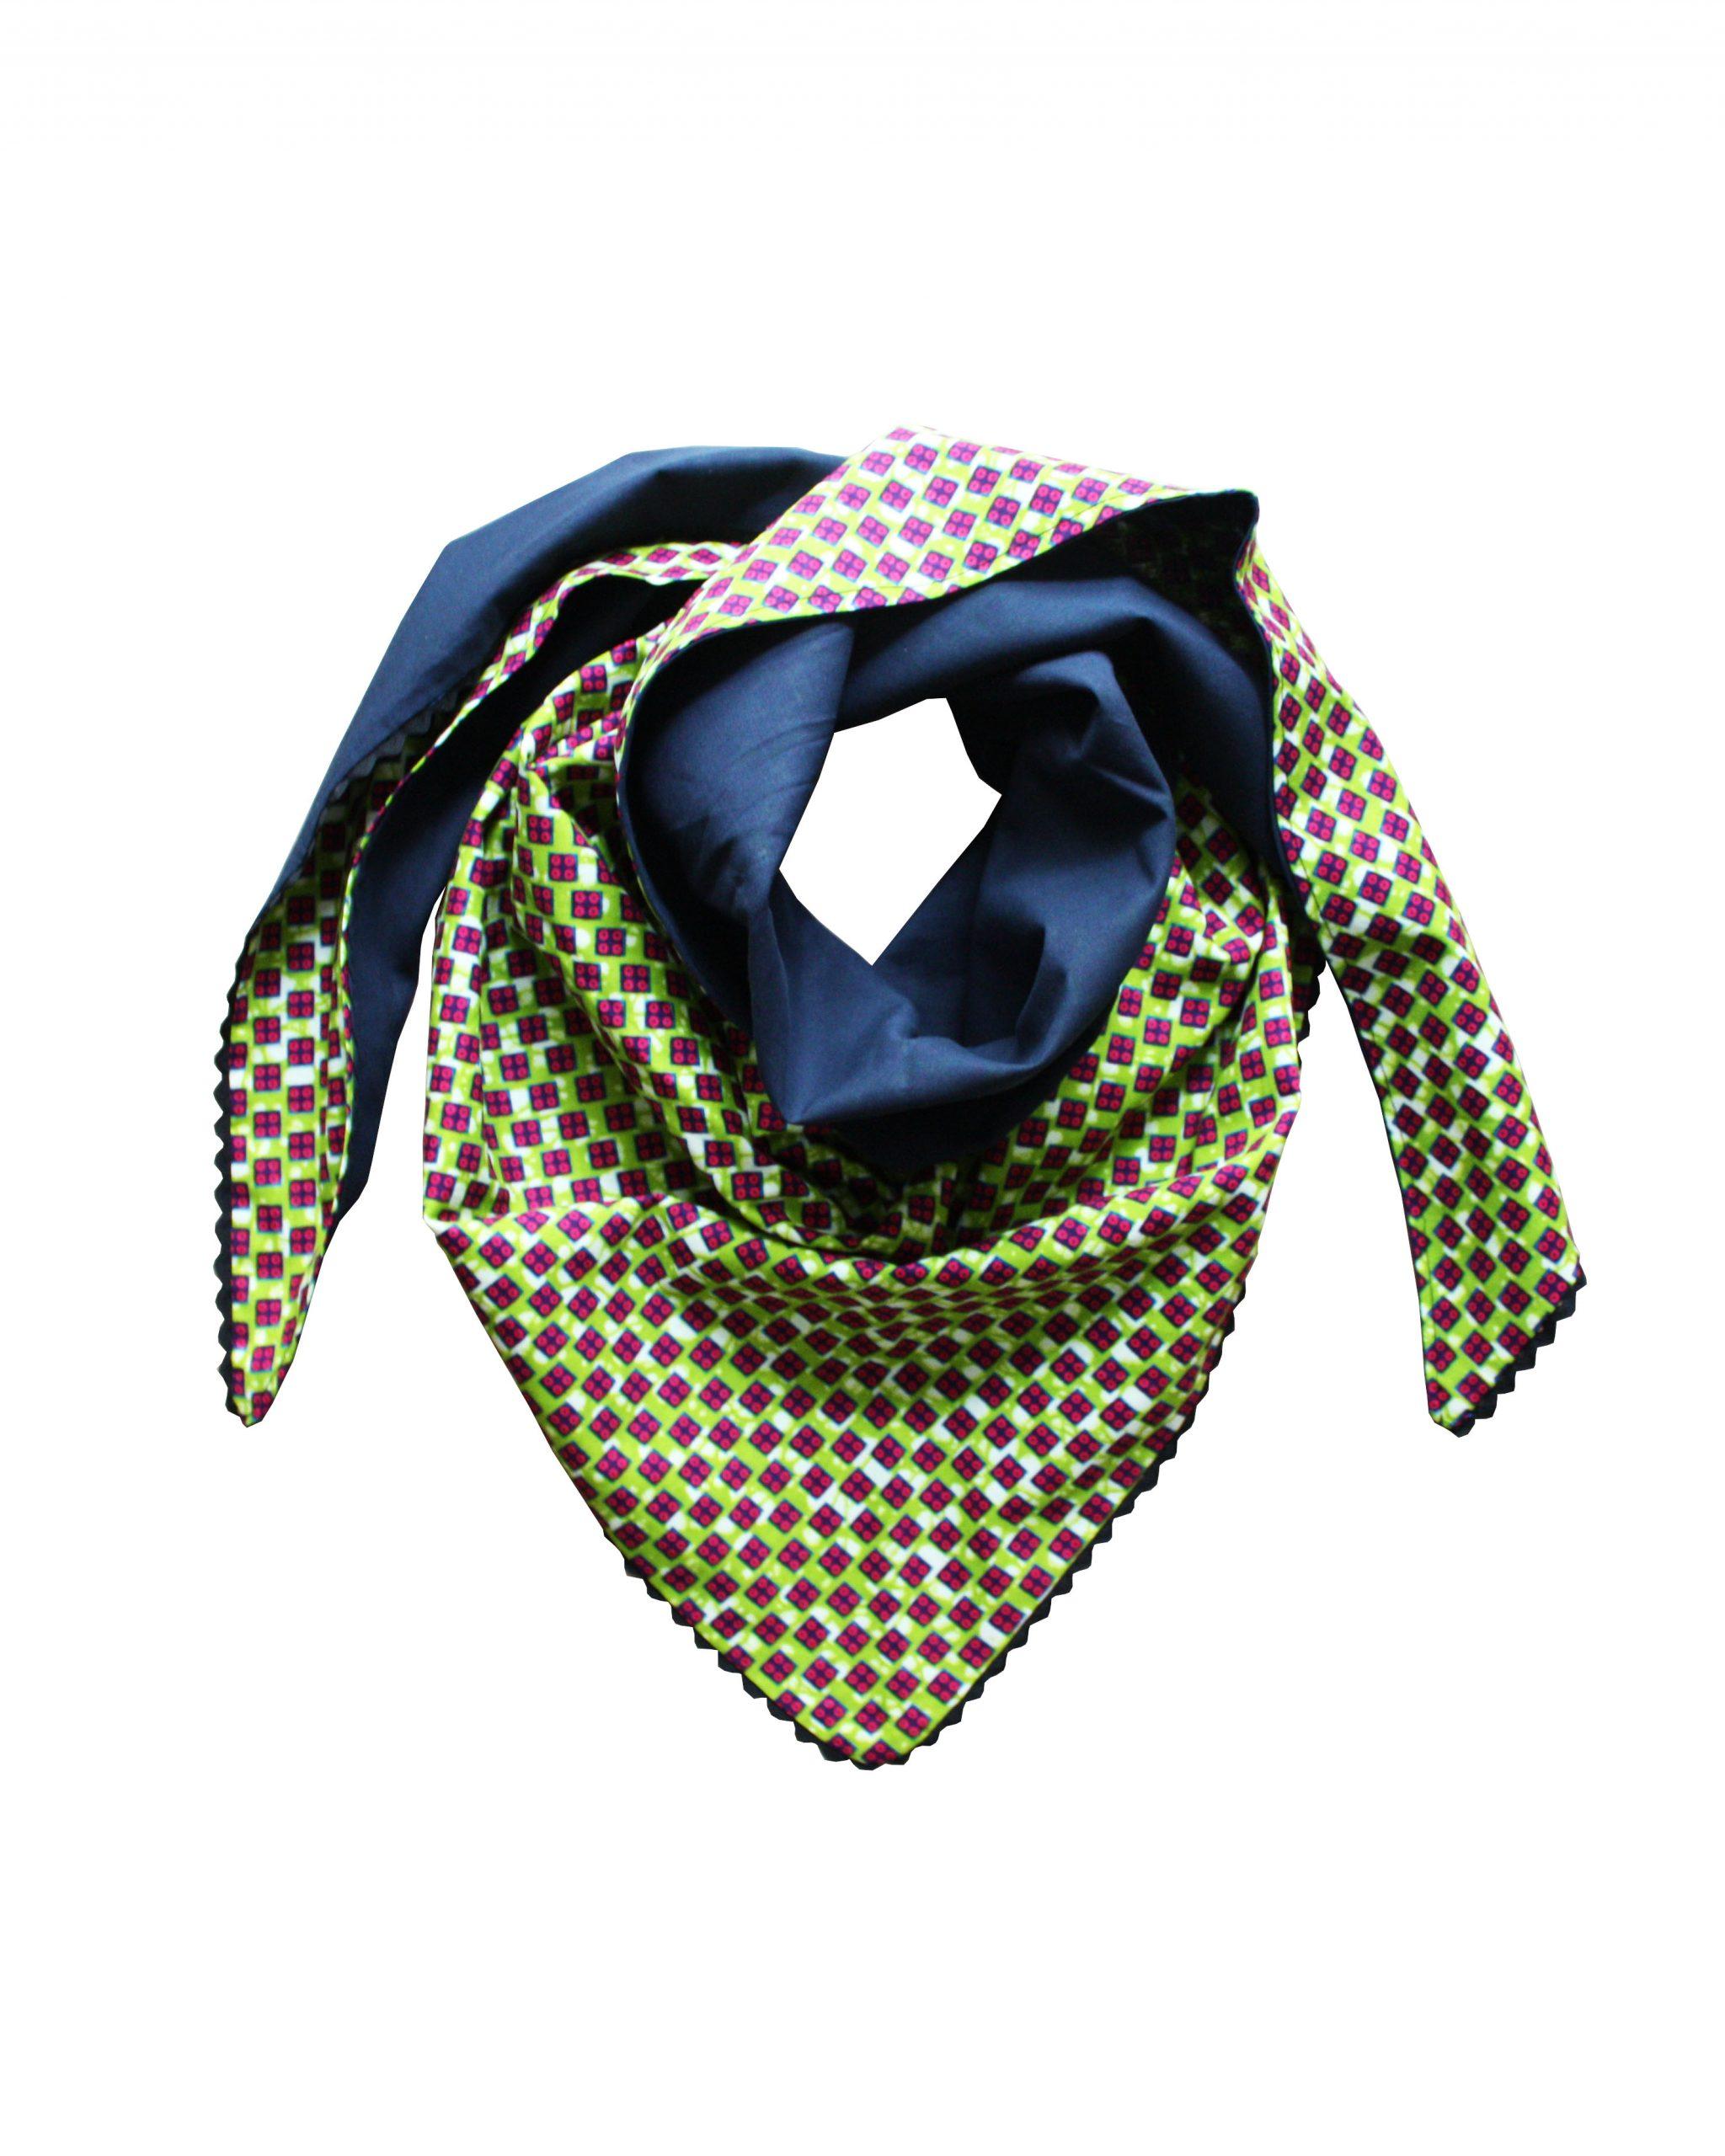 Le Noeud Kipé - Accessoires Wax Tissu africain - Cheche Ludo Vert